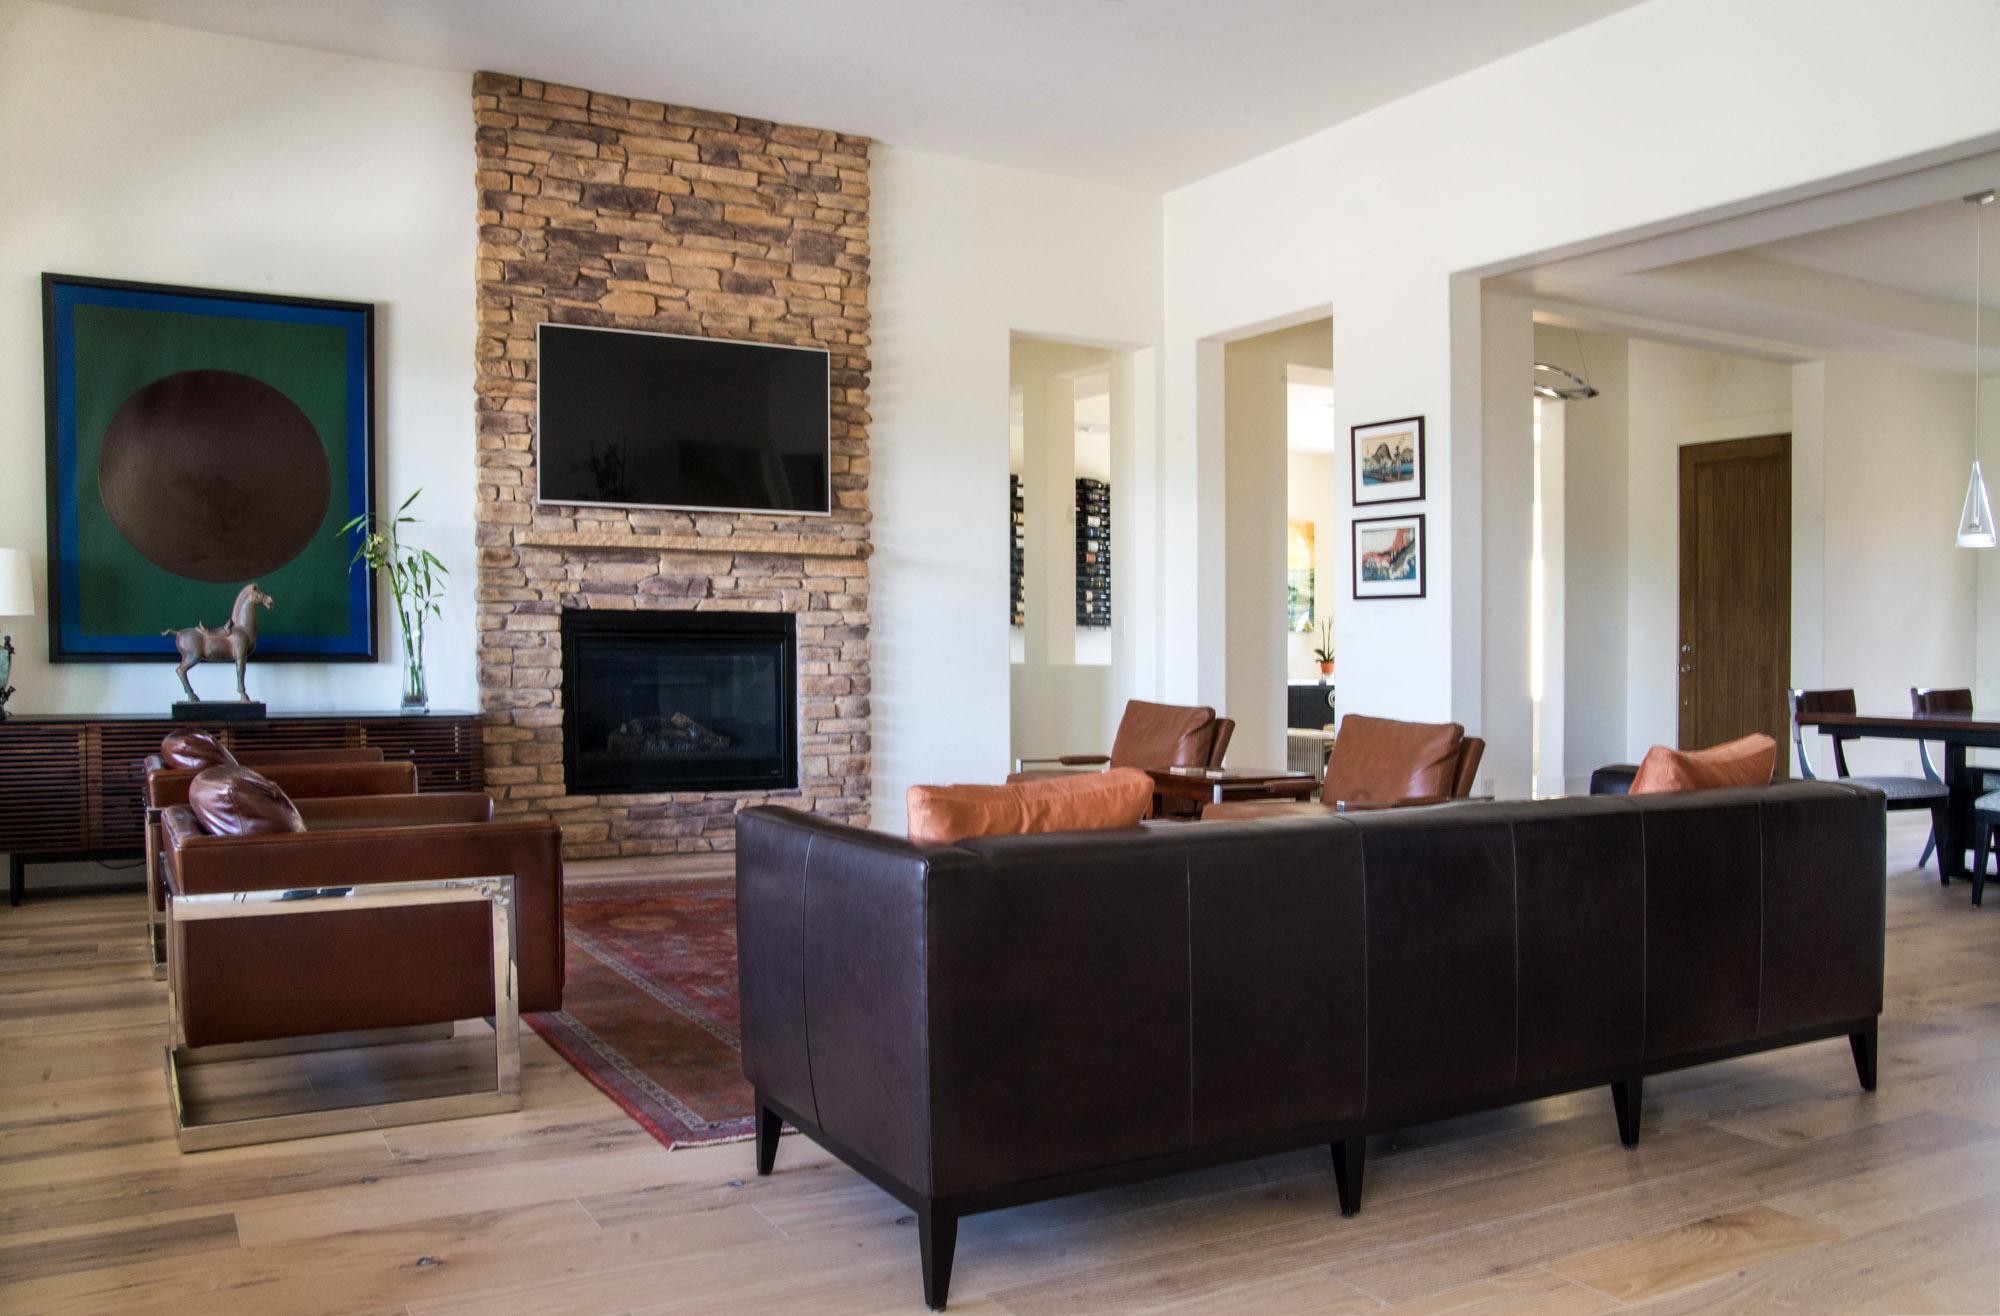 Mount Rose Estates living room renovation and entry design - Reno, Nevada - Kovac Design